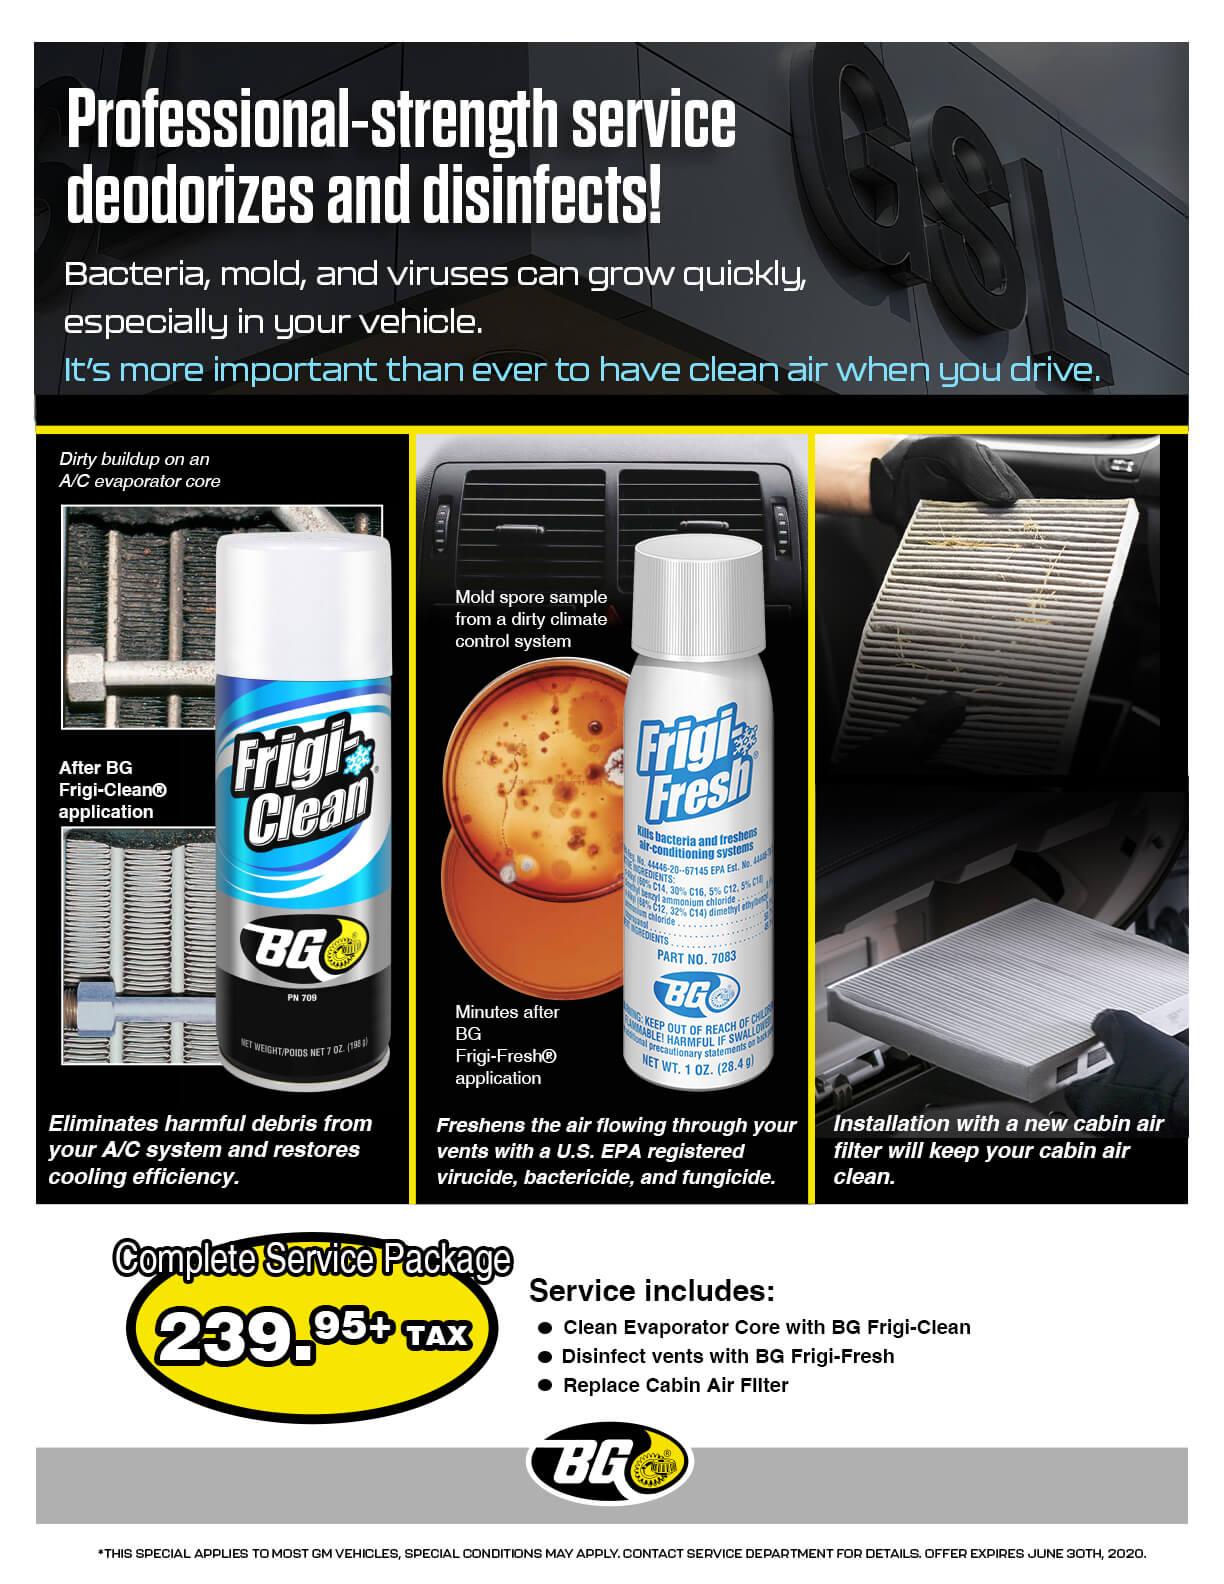 Air System Deodorize Promo